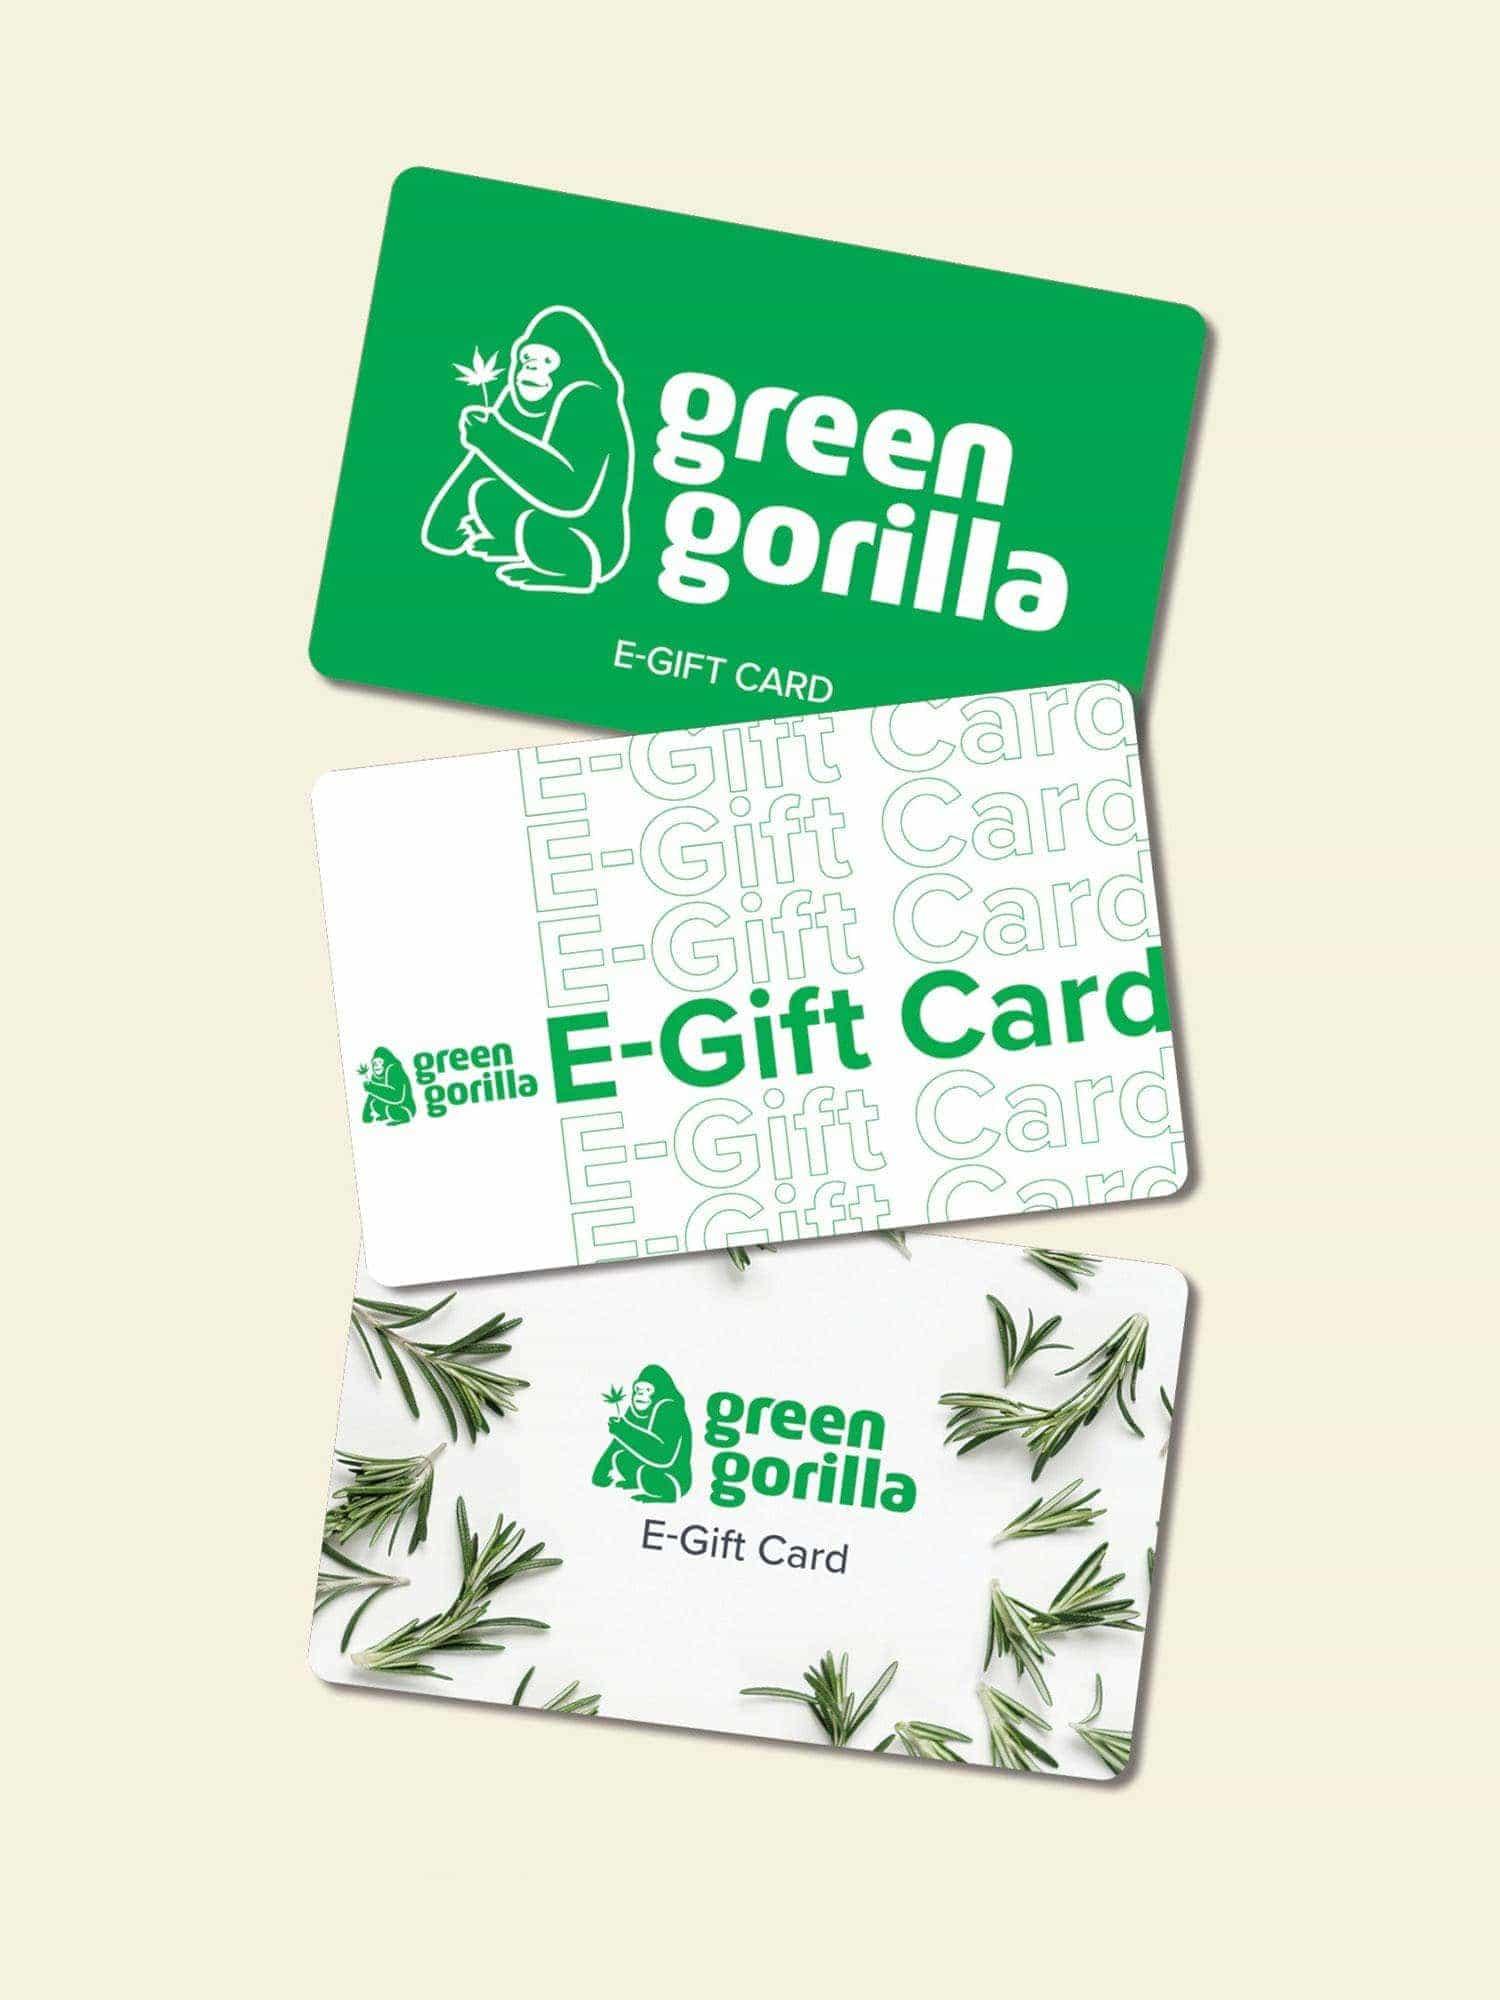 Green Gorilla Premium CBD E-Gift Card